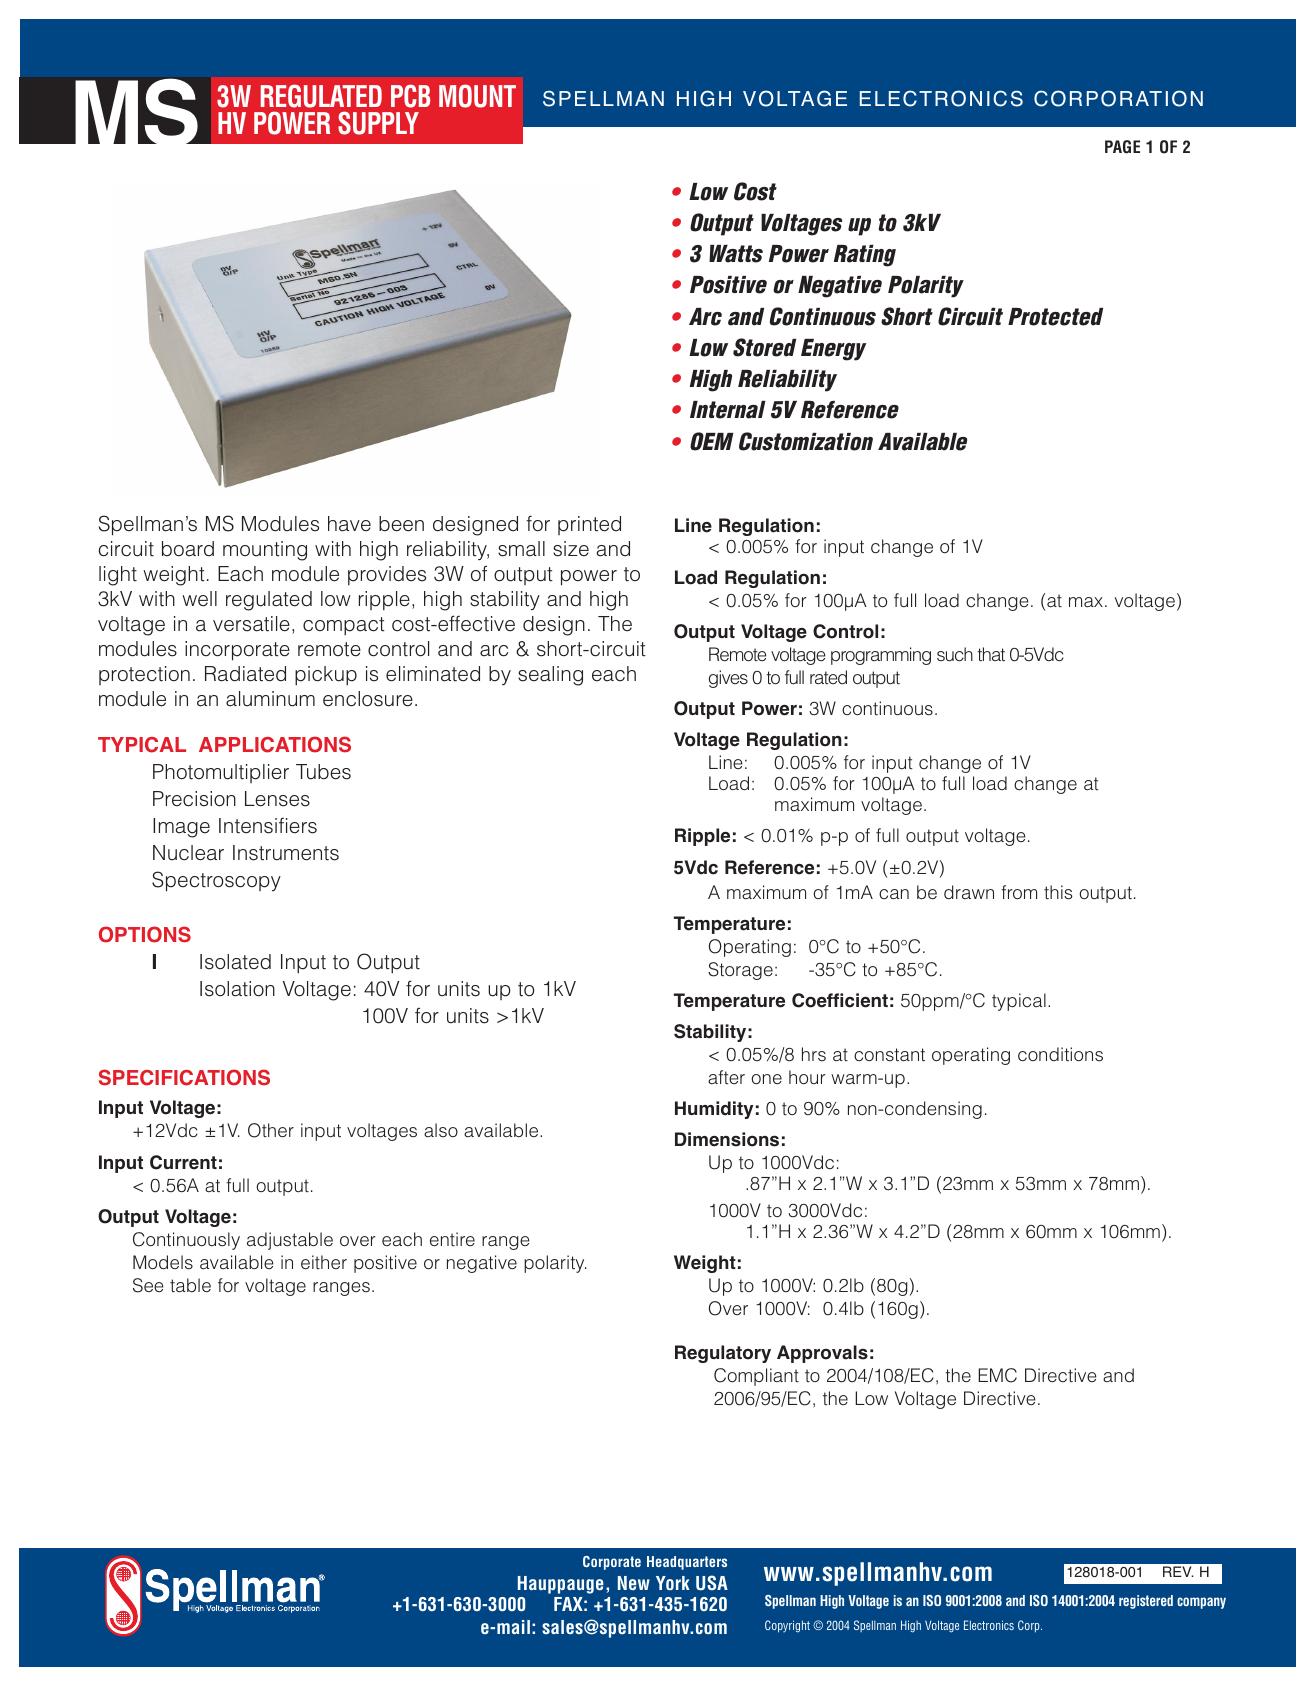 3 Watt Regulated Printer Circuit Board Mounted High Voltage